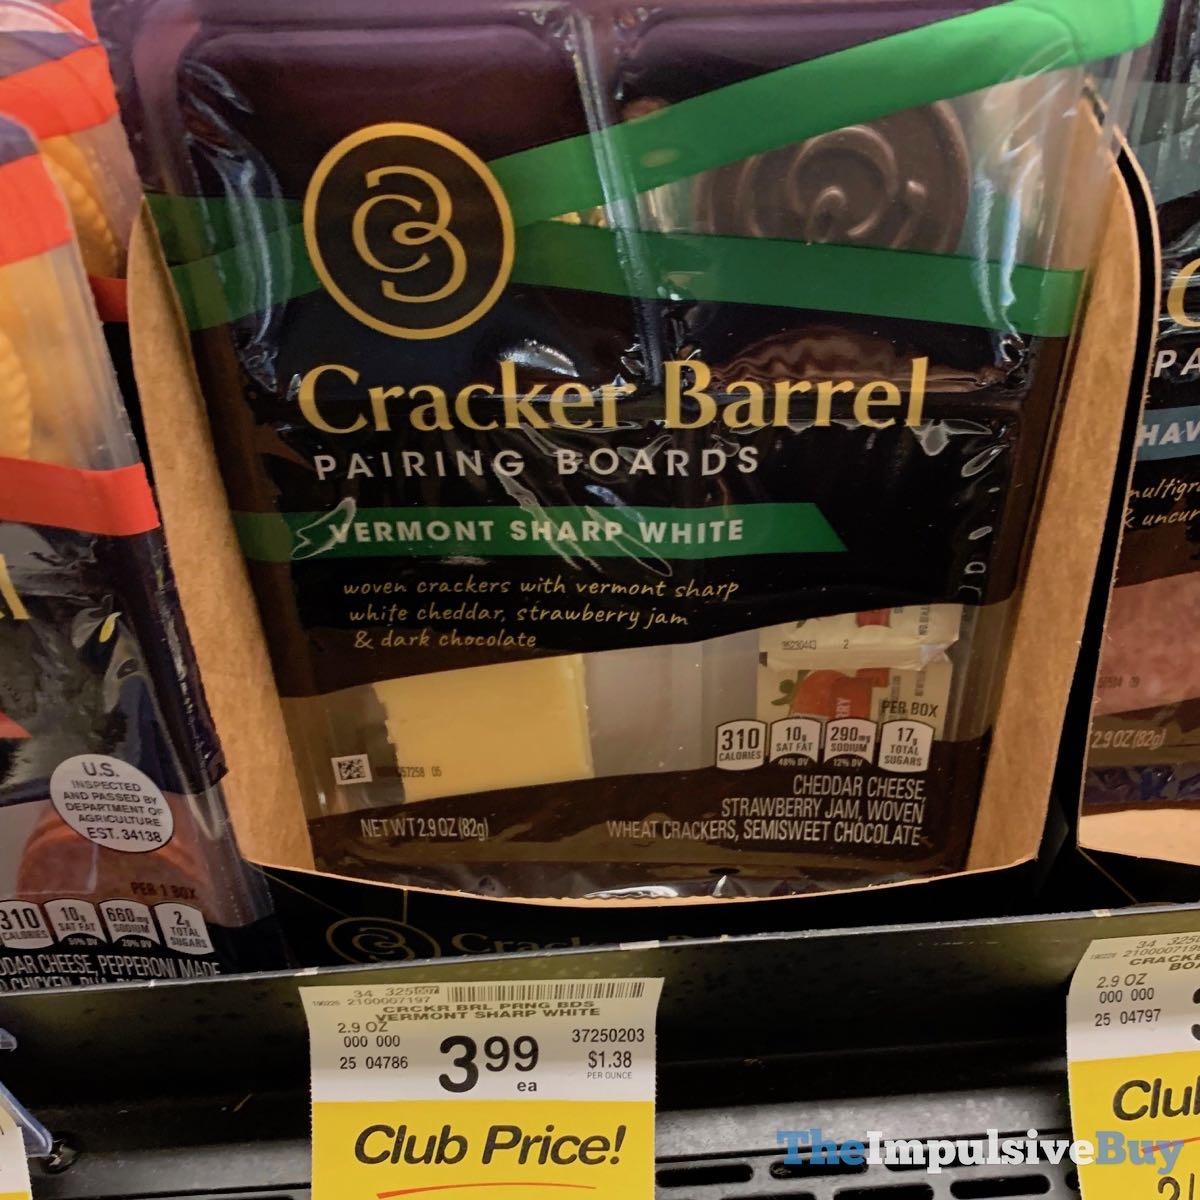 1ee7a3eb374e Cracker-Barrel-Pairing-Boards-Vermont-Sharp-White.jpg - The ...